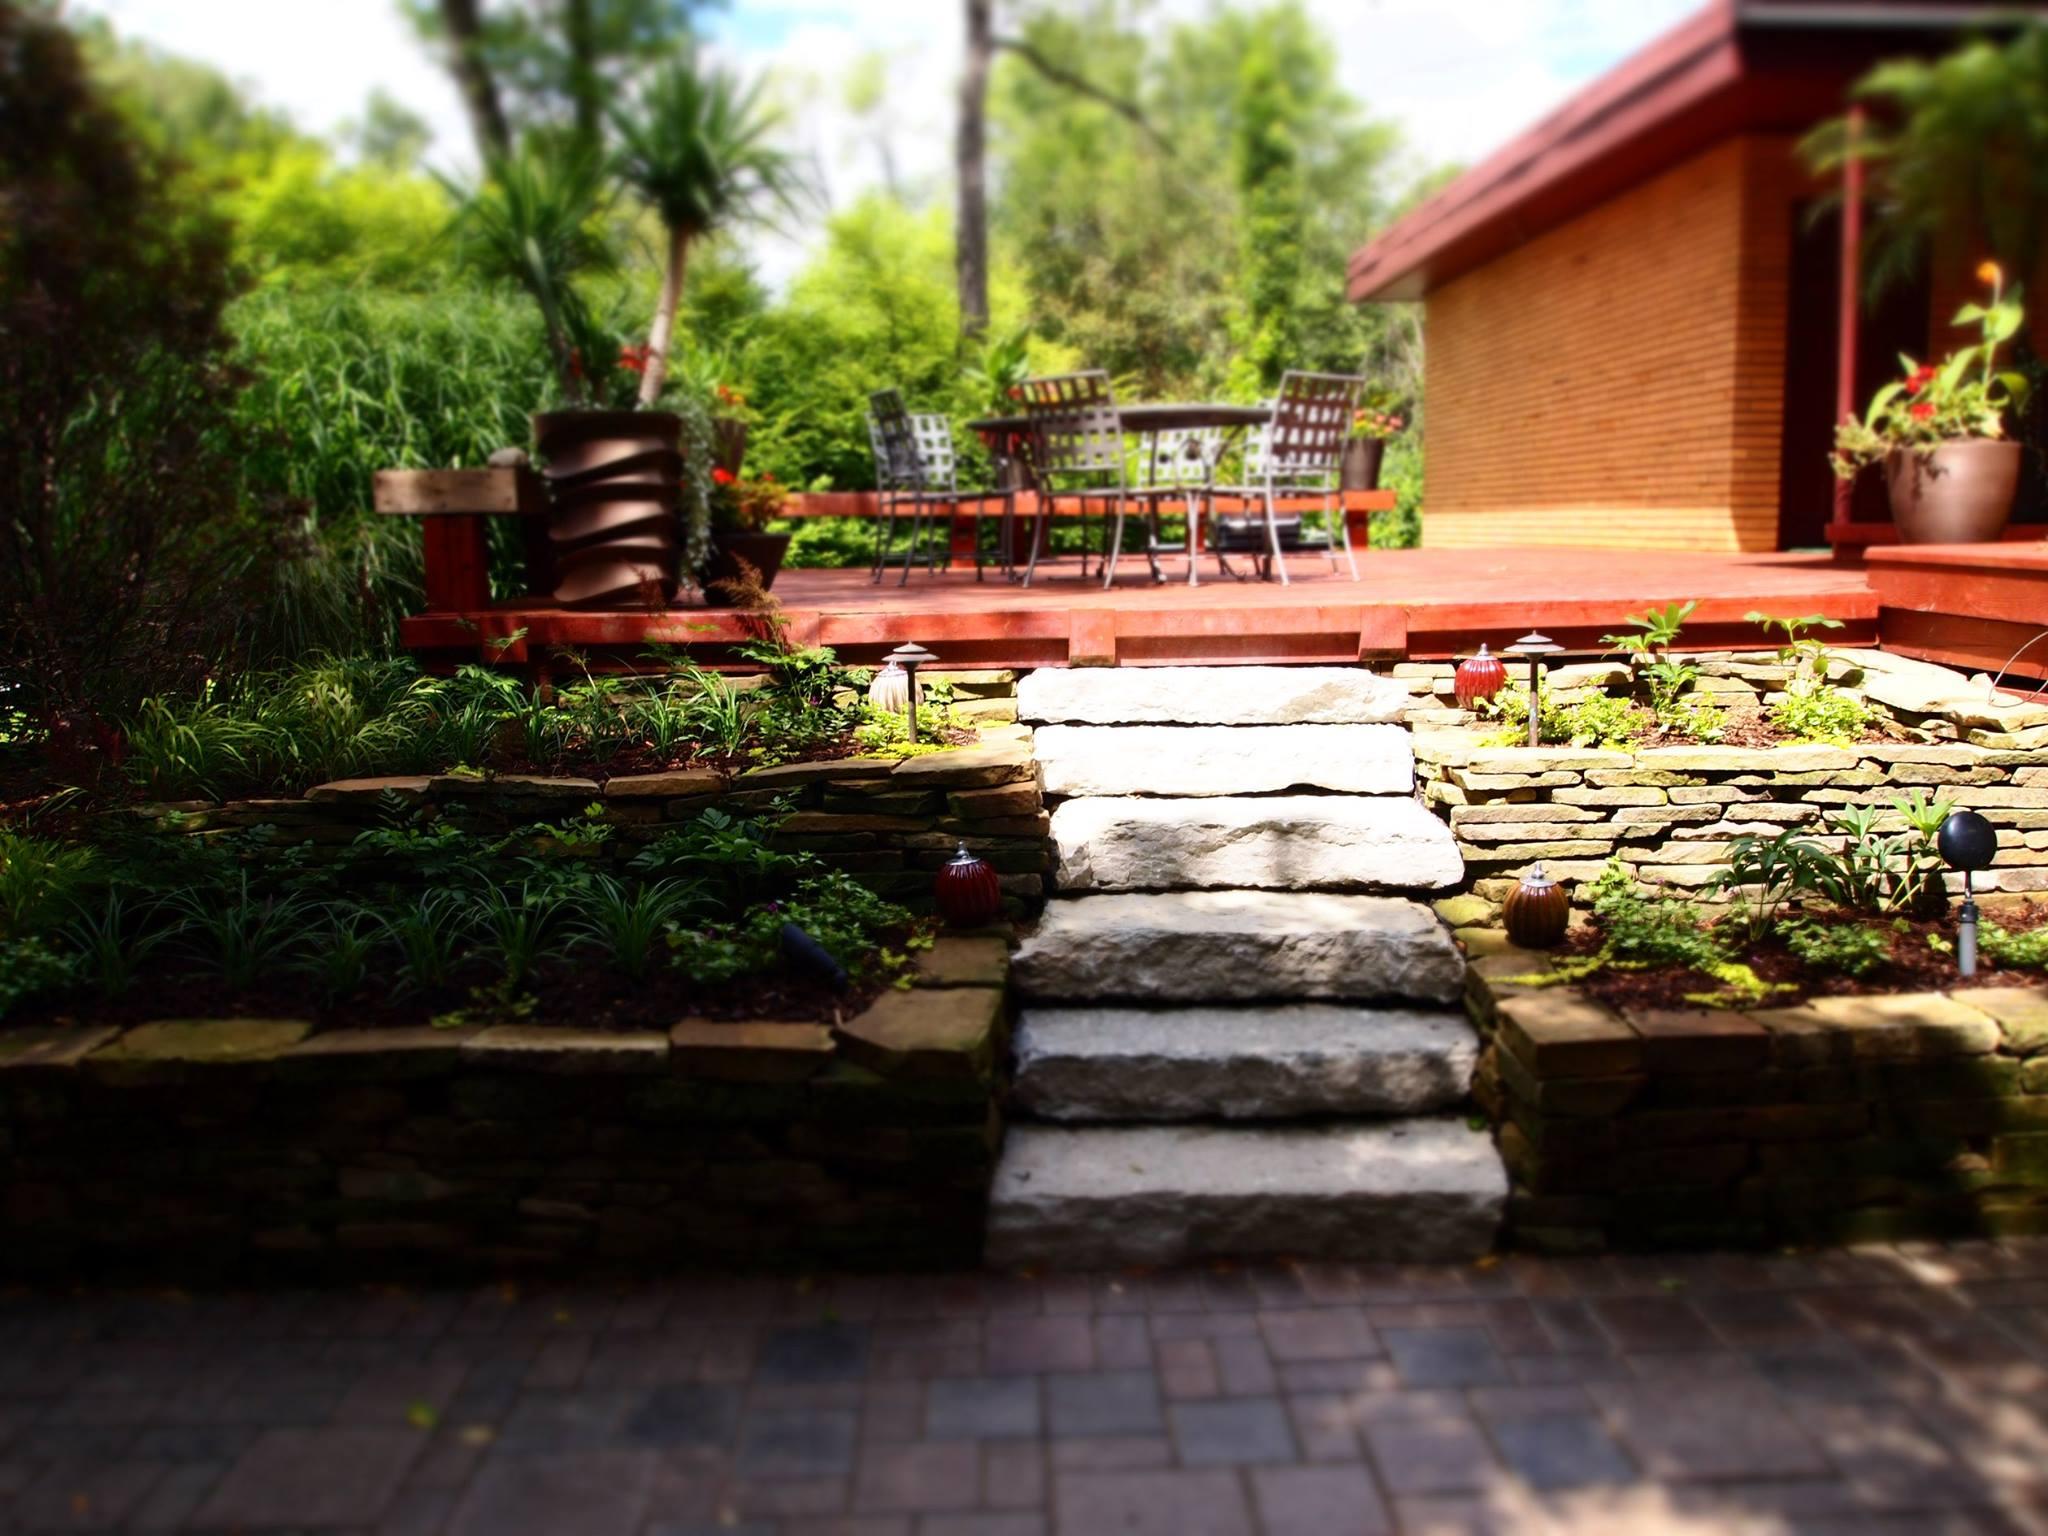 Patio Deck Design Ideas for Luxury Backyards | Backyard Mamma on Luxury Backyard Design id=38491